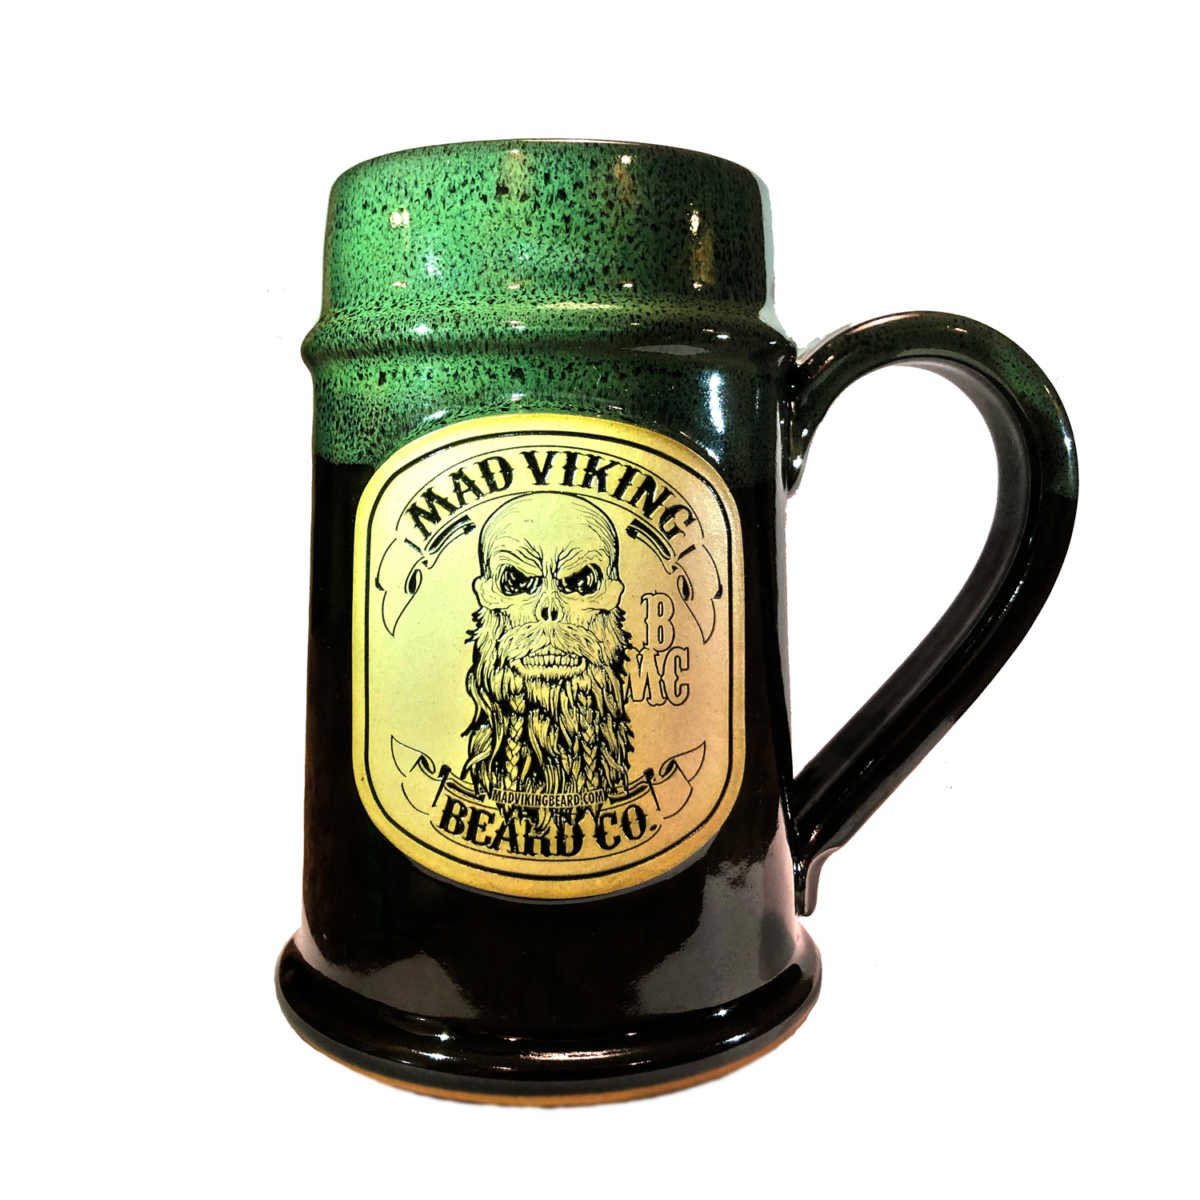 Mad Viking Skully Mug O' Doom